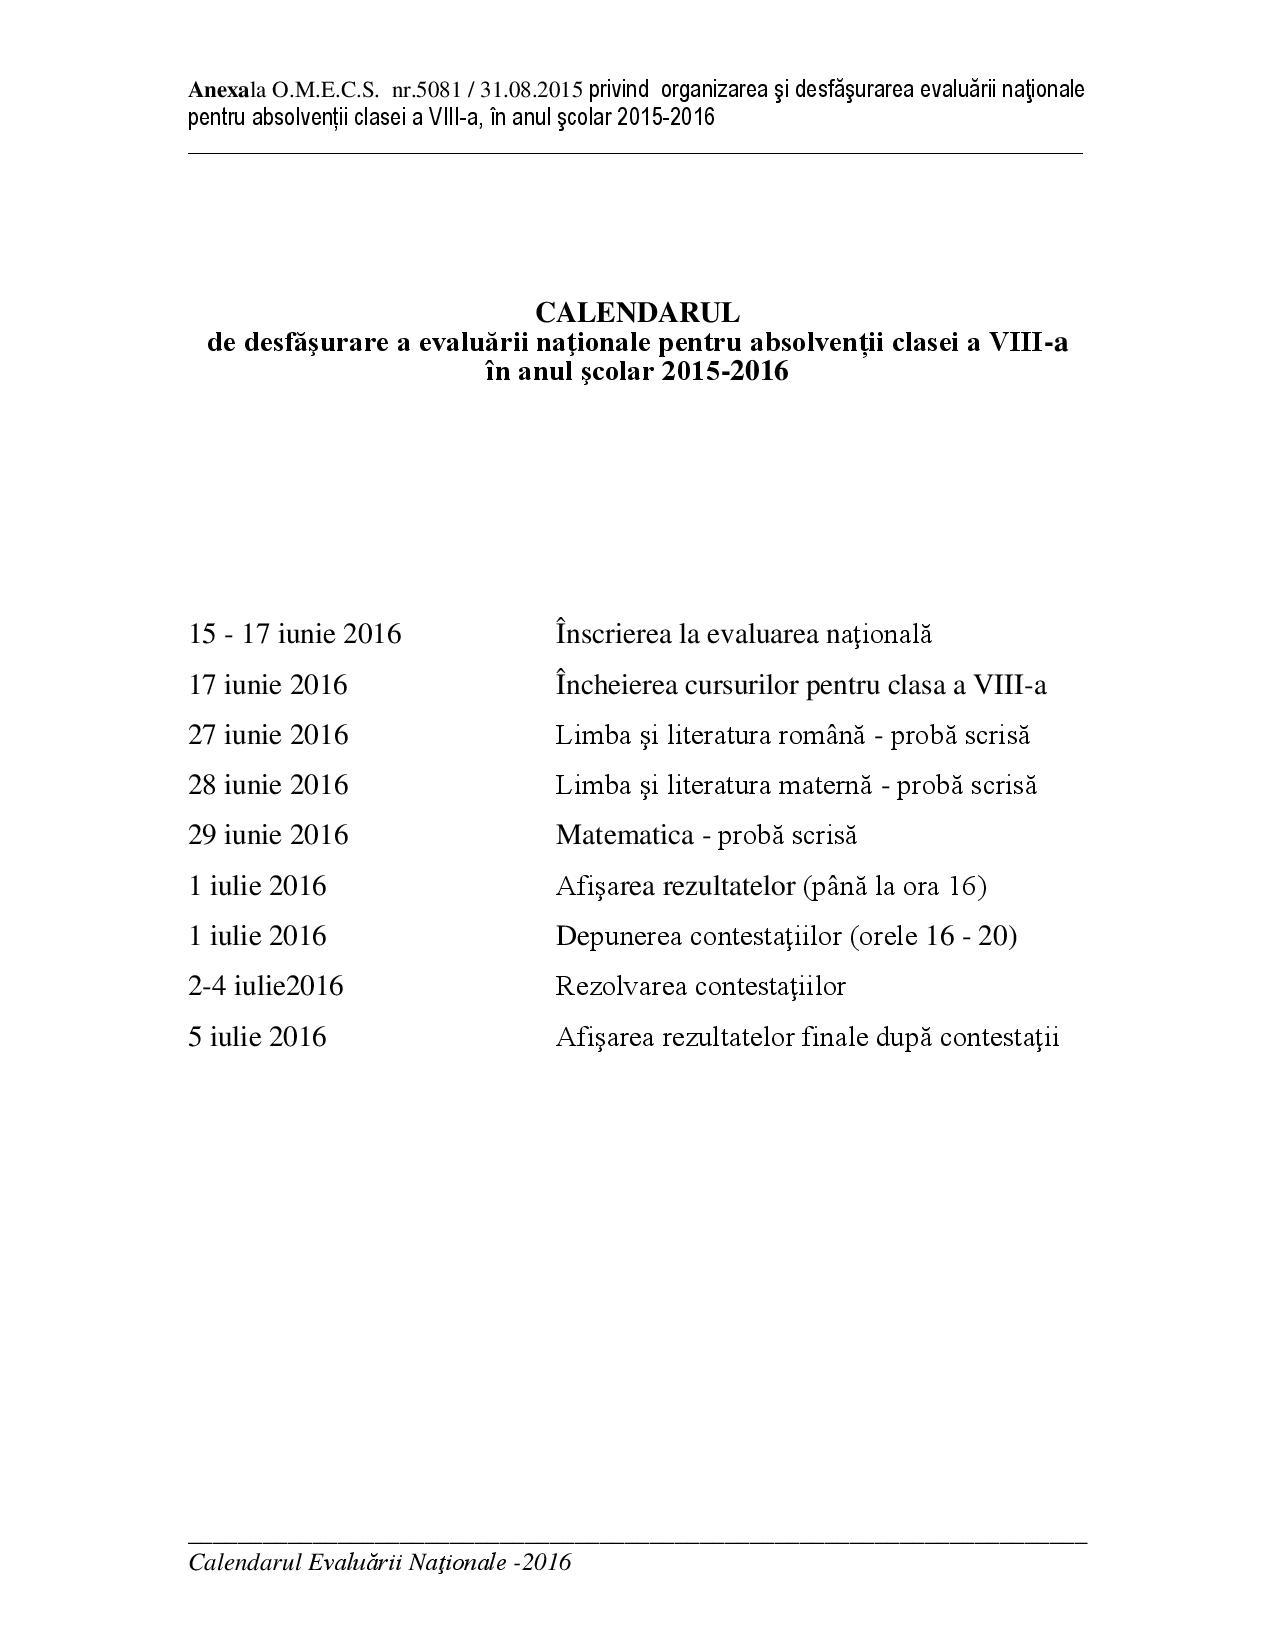 Anexa ordin_CALENDAR_evaluare nationala 2016-page-001